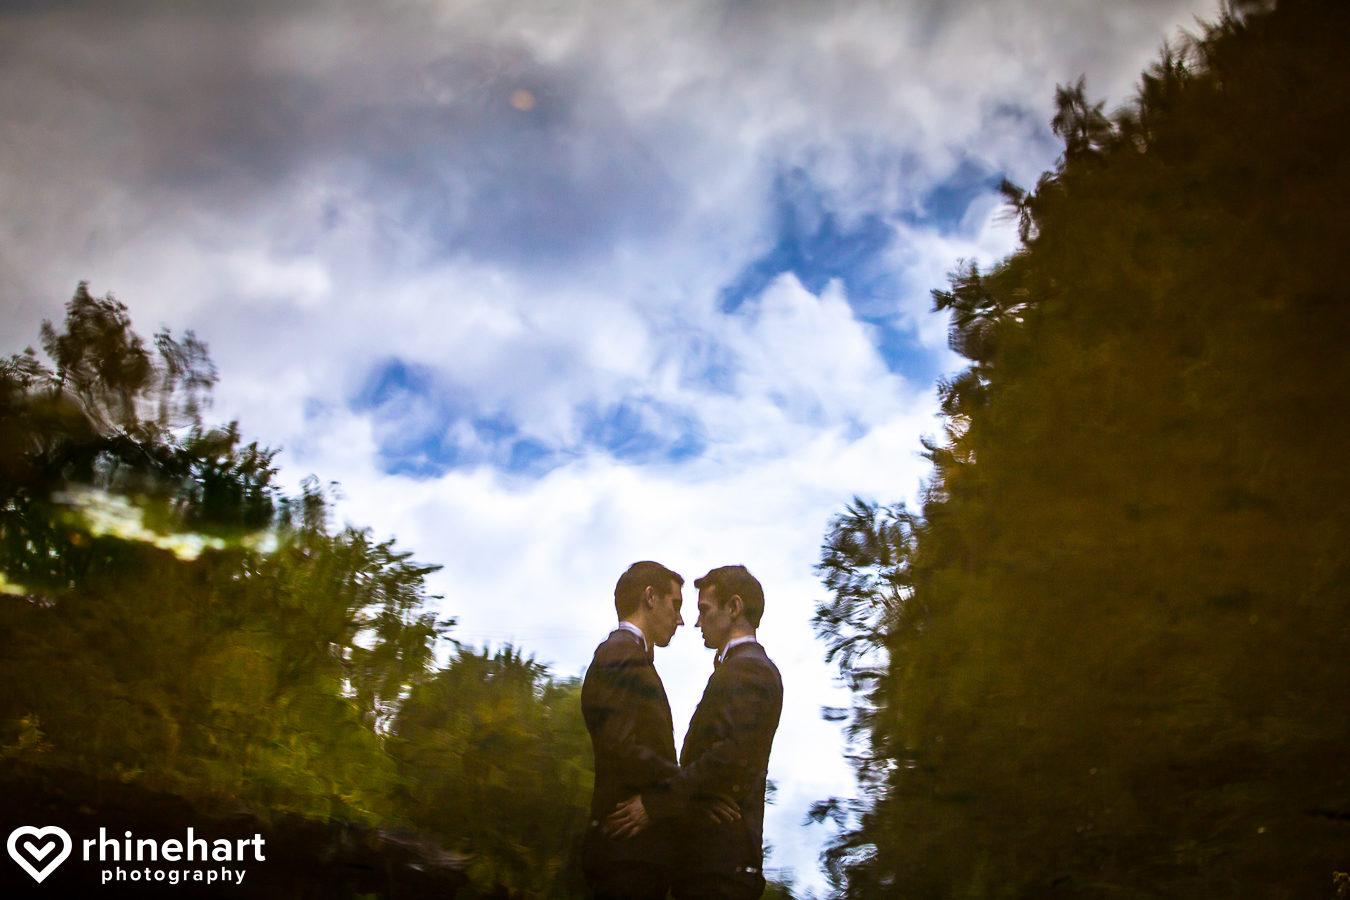 ledges-hotel-wedding-photographers-poconos-hawley-pa-best-creative-unique-artistic-fun-romantic-151